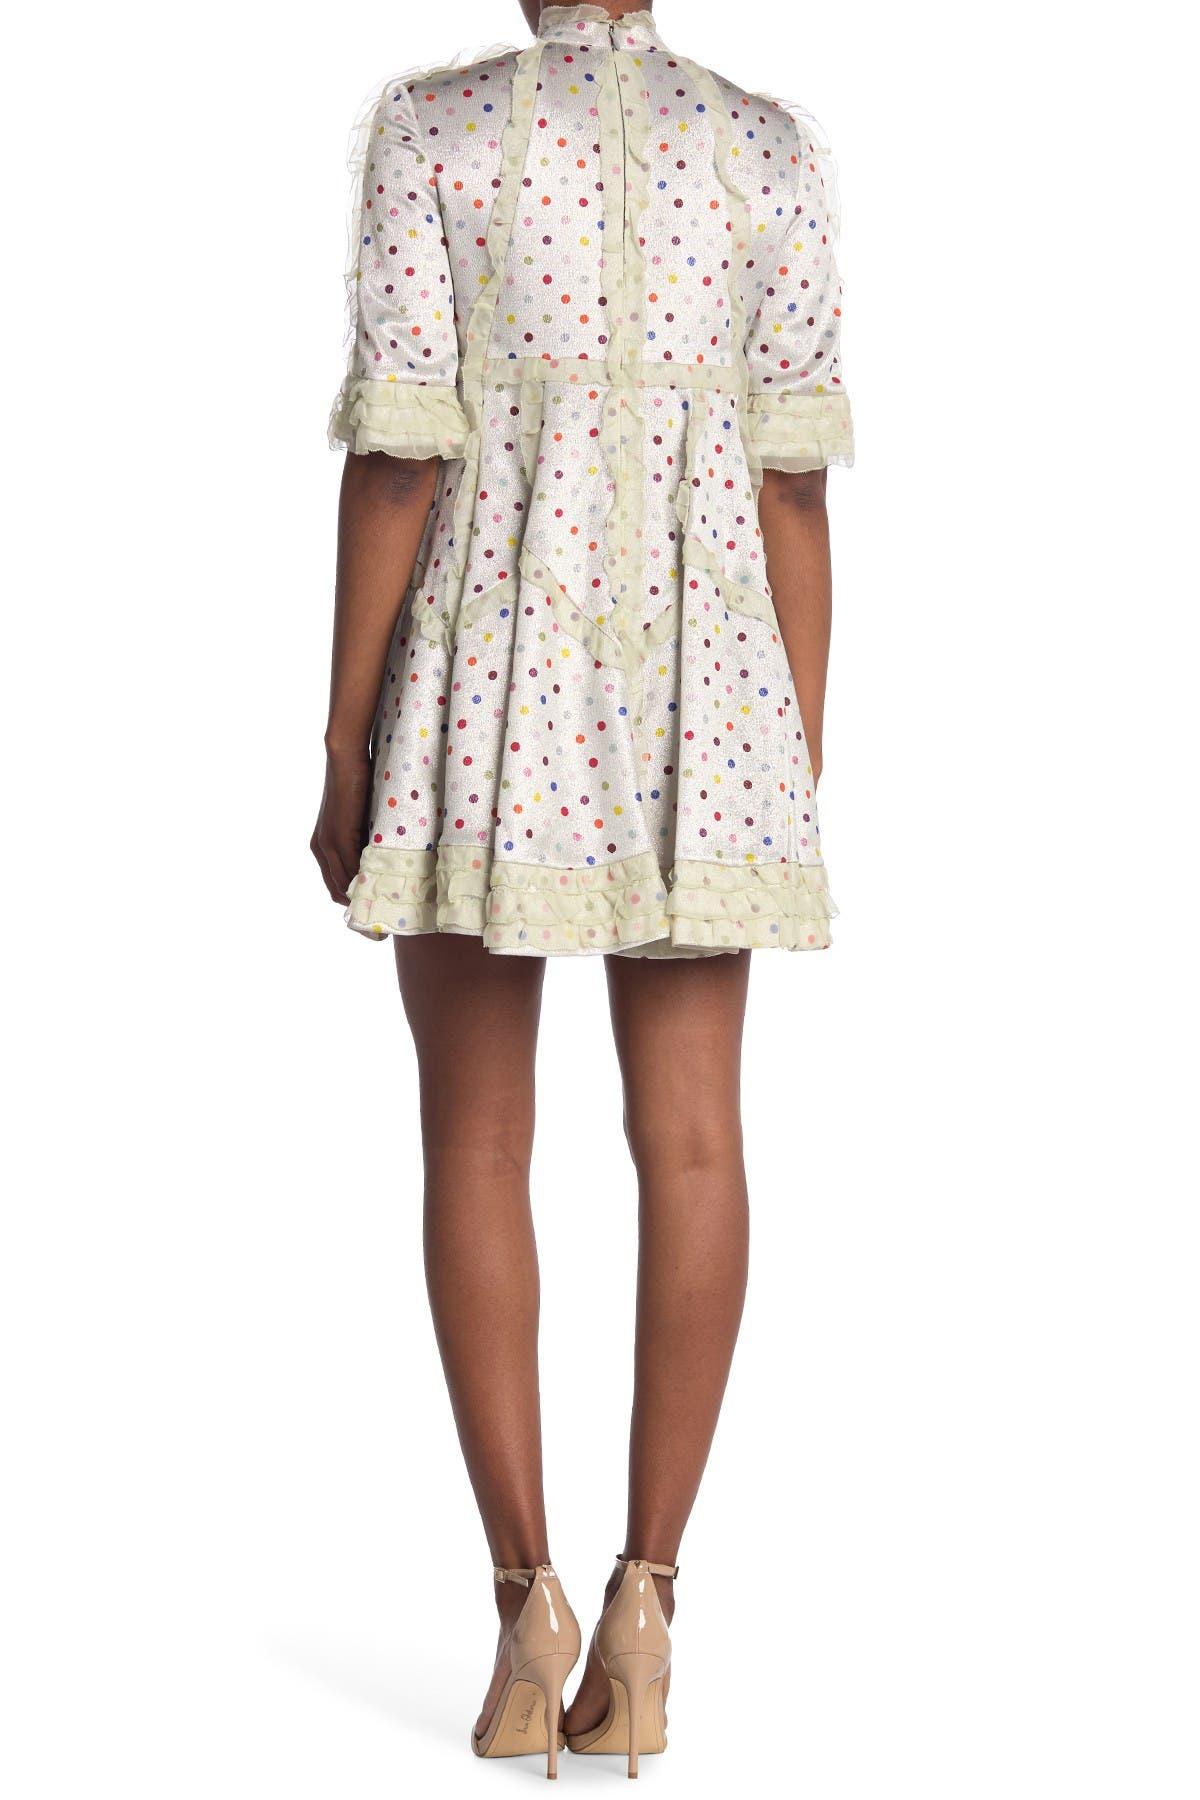 Image of Valentino Dot Print Ruffle Trim Dress